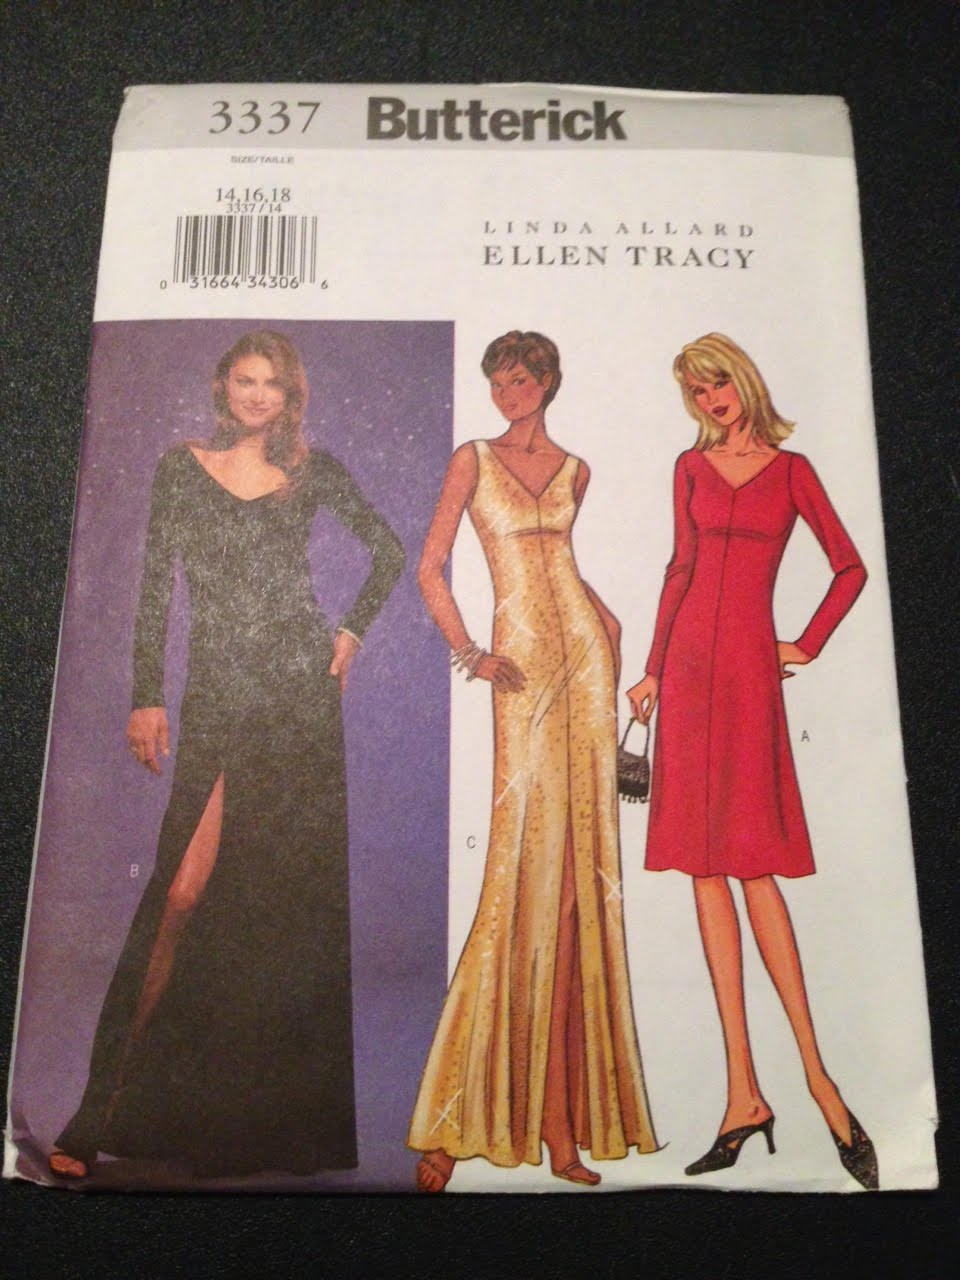 Butterick 3337 Sewing Pattern, Misses' Petite Dress, Size 14,16,18